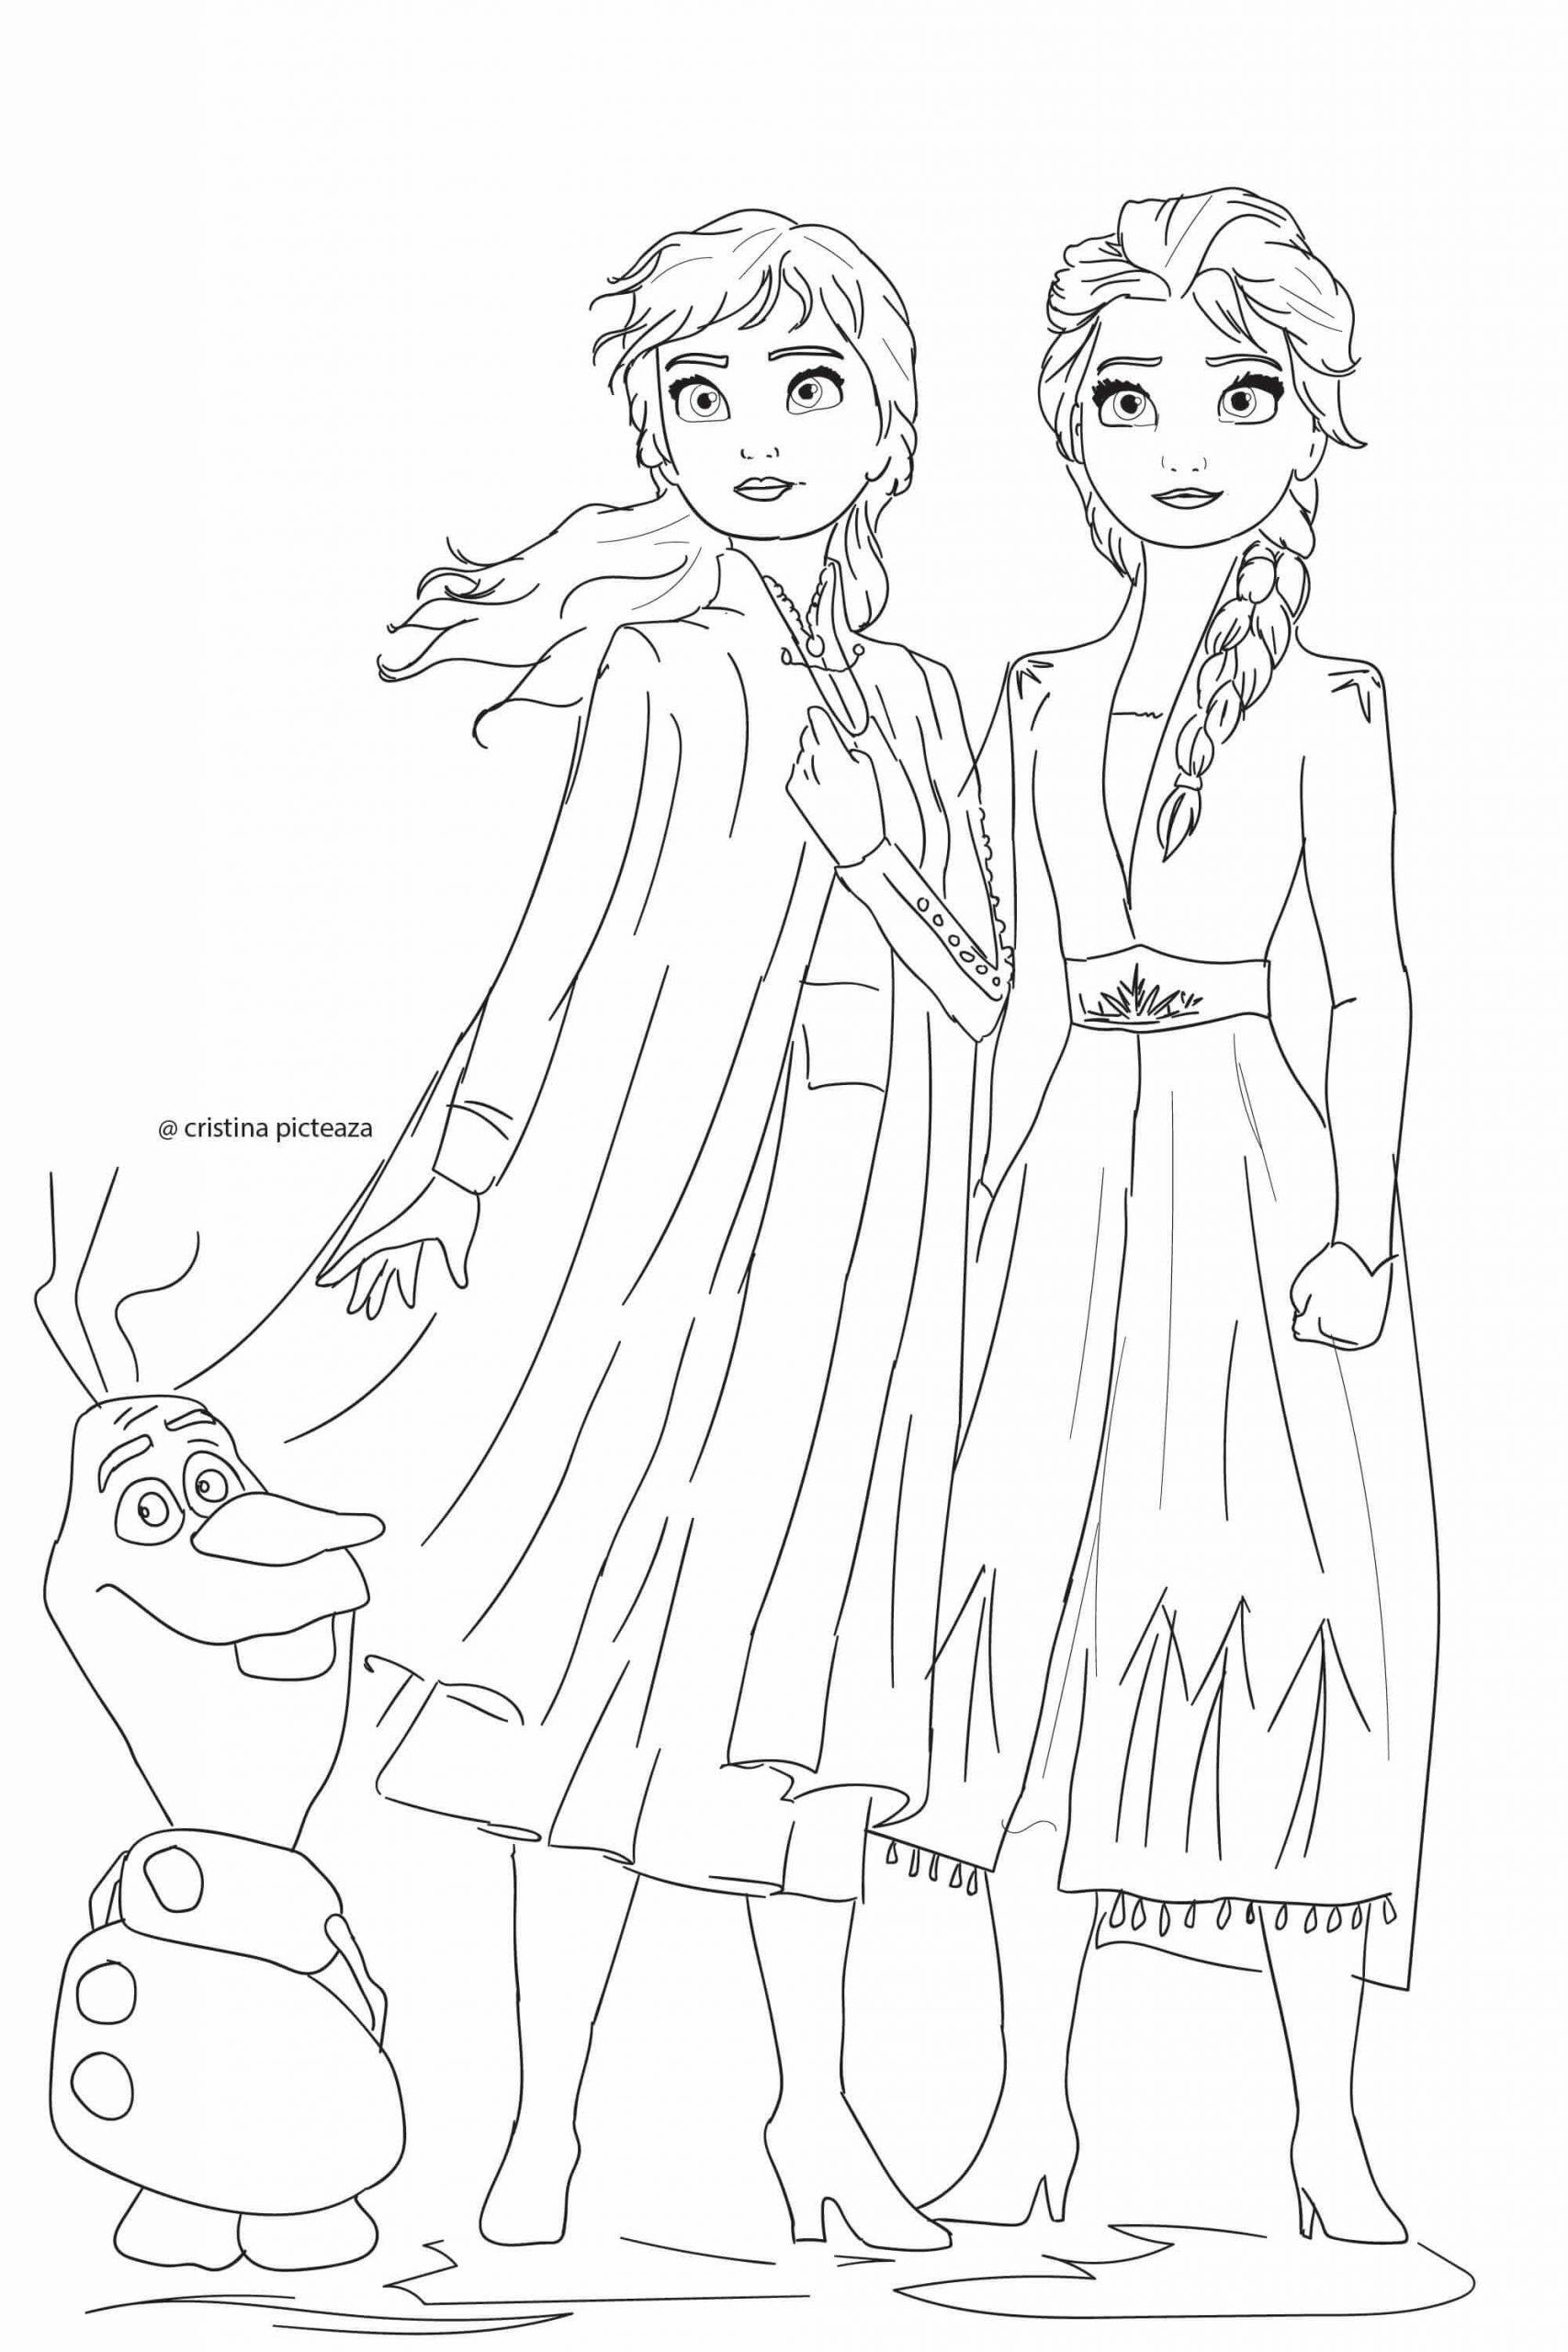 - Elsa And Anna Colouring Pages Free لم يسبق له مثيل الصور + Tier3.xyz